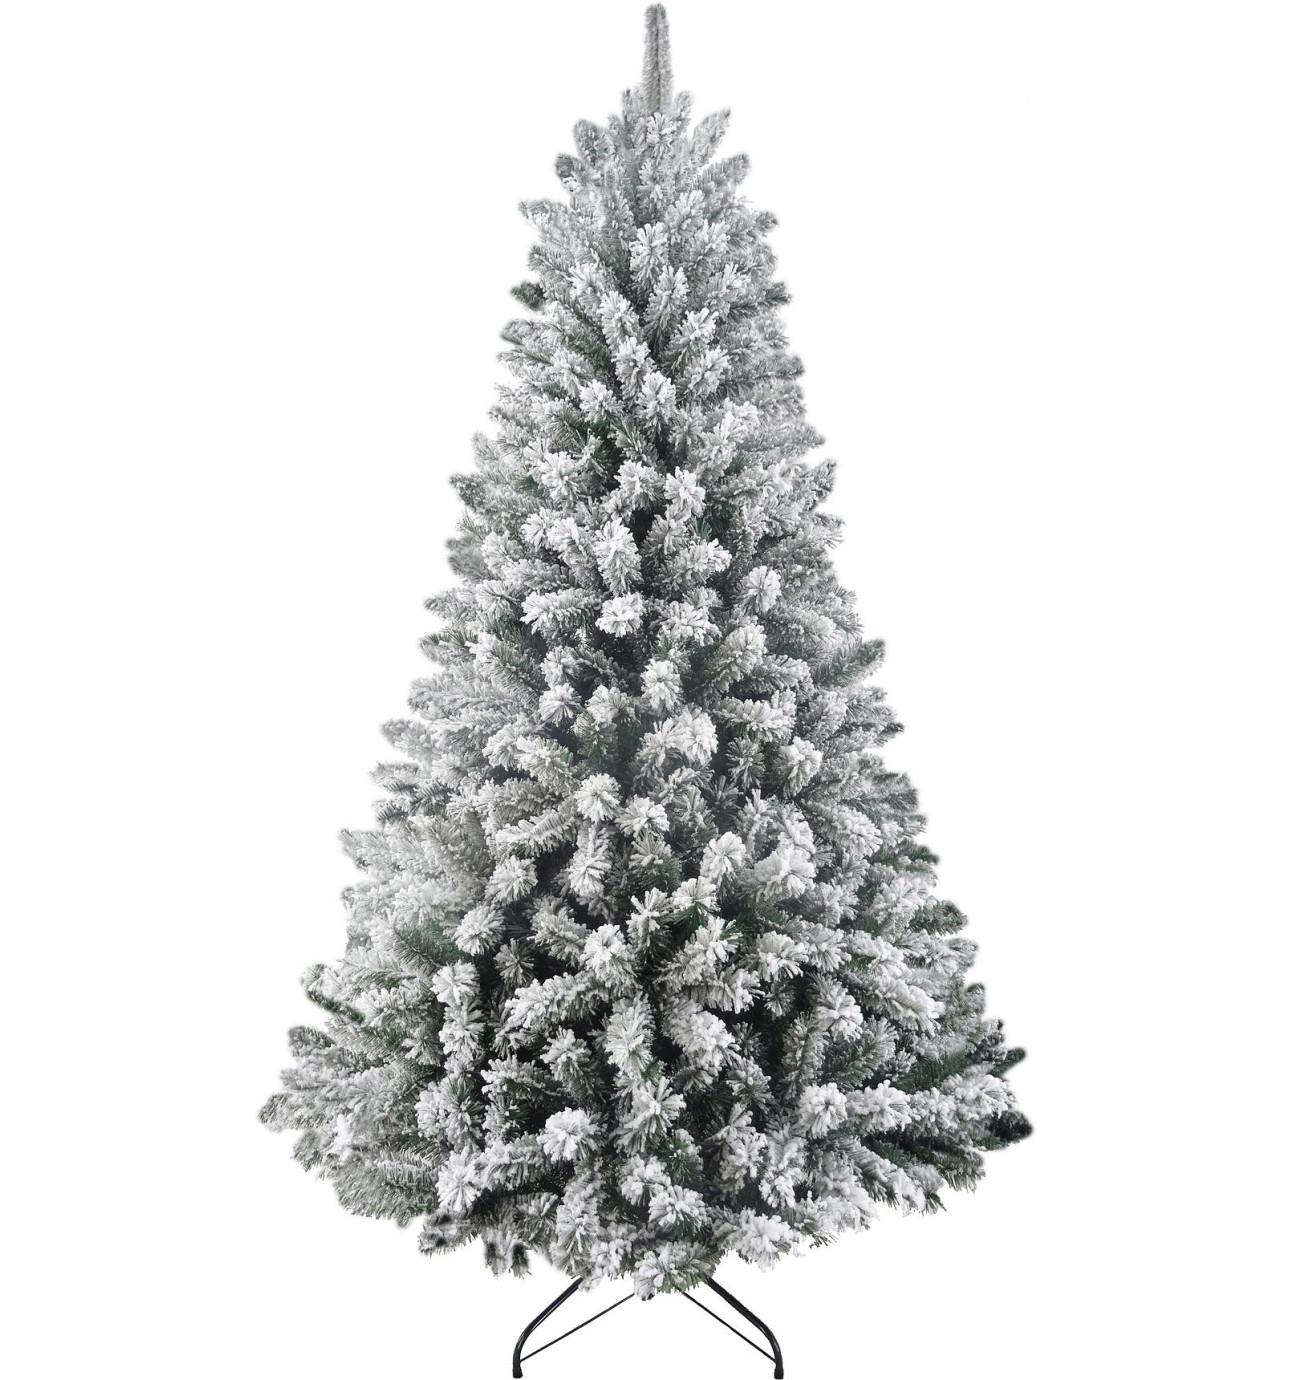 210cm north star flocked tree green - Christmas Trees Online